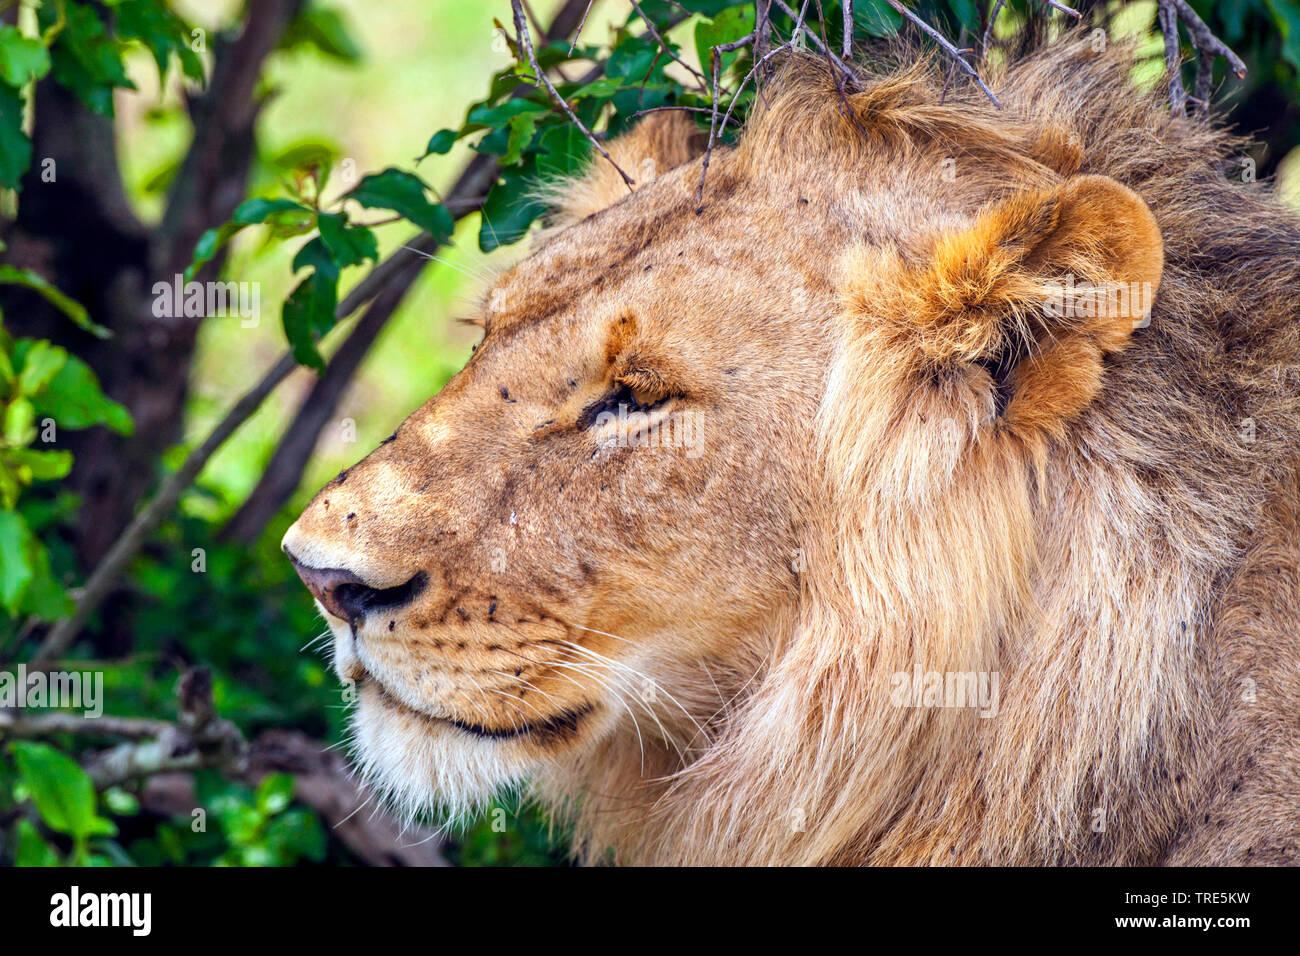 lion (Panthera leo), male lion, portrait, Kenya, Masai Mara National Park Stock Photo